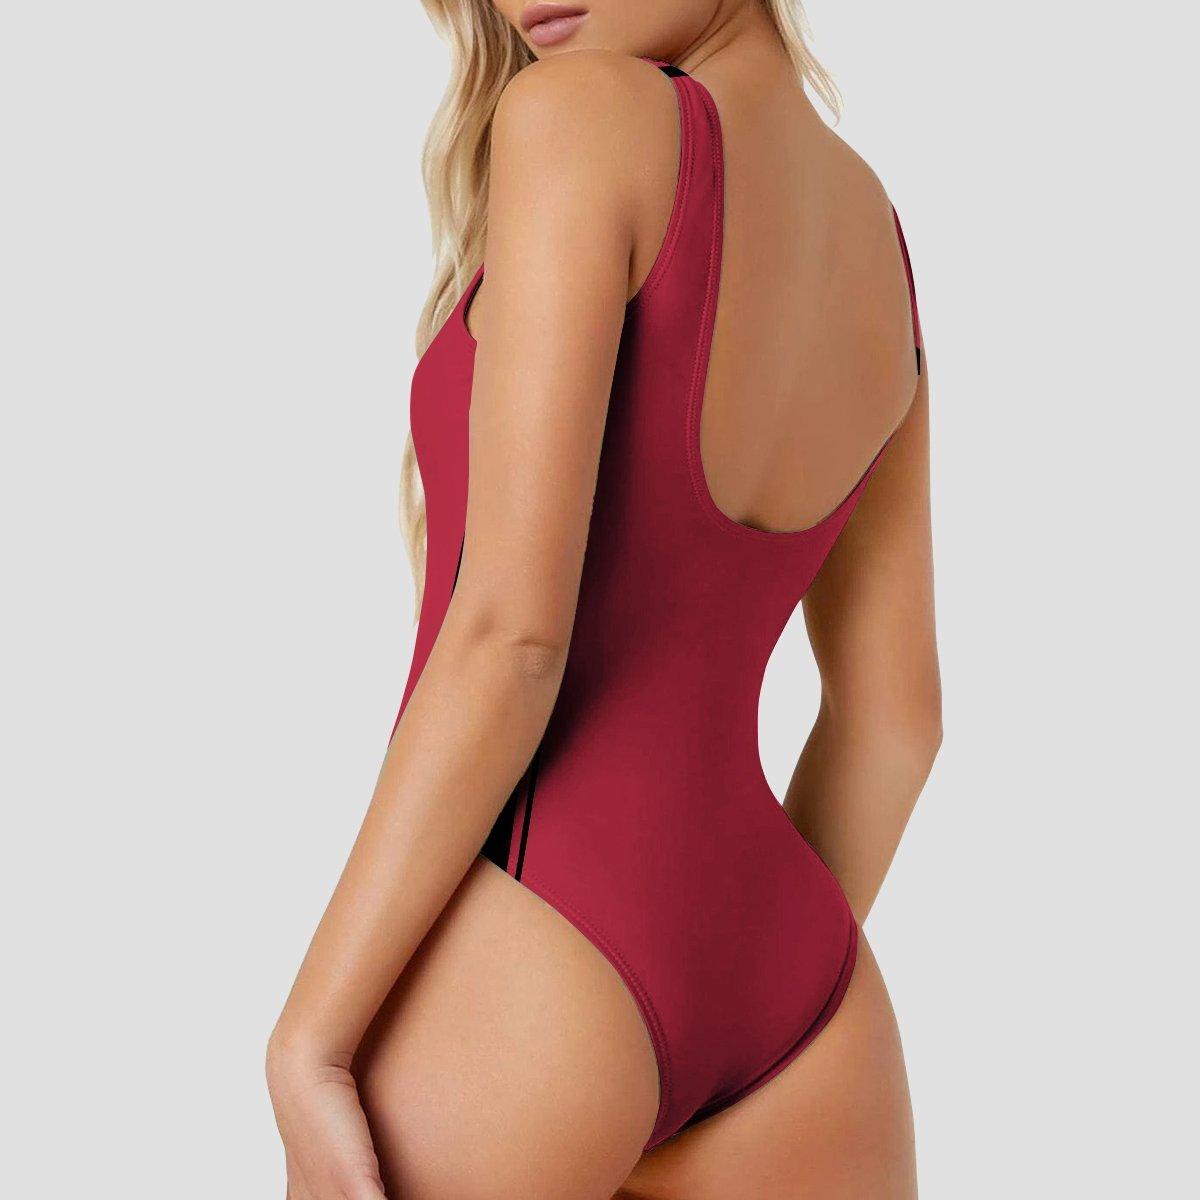 3XL Official Anime Swimsuit Merch